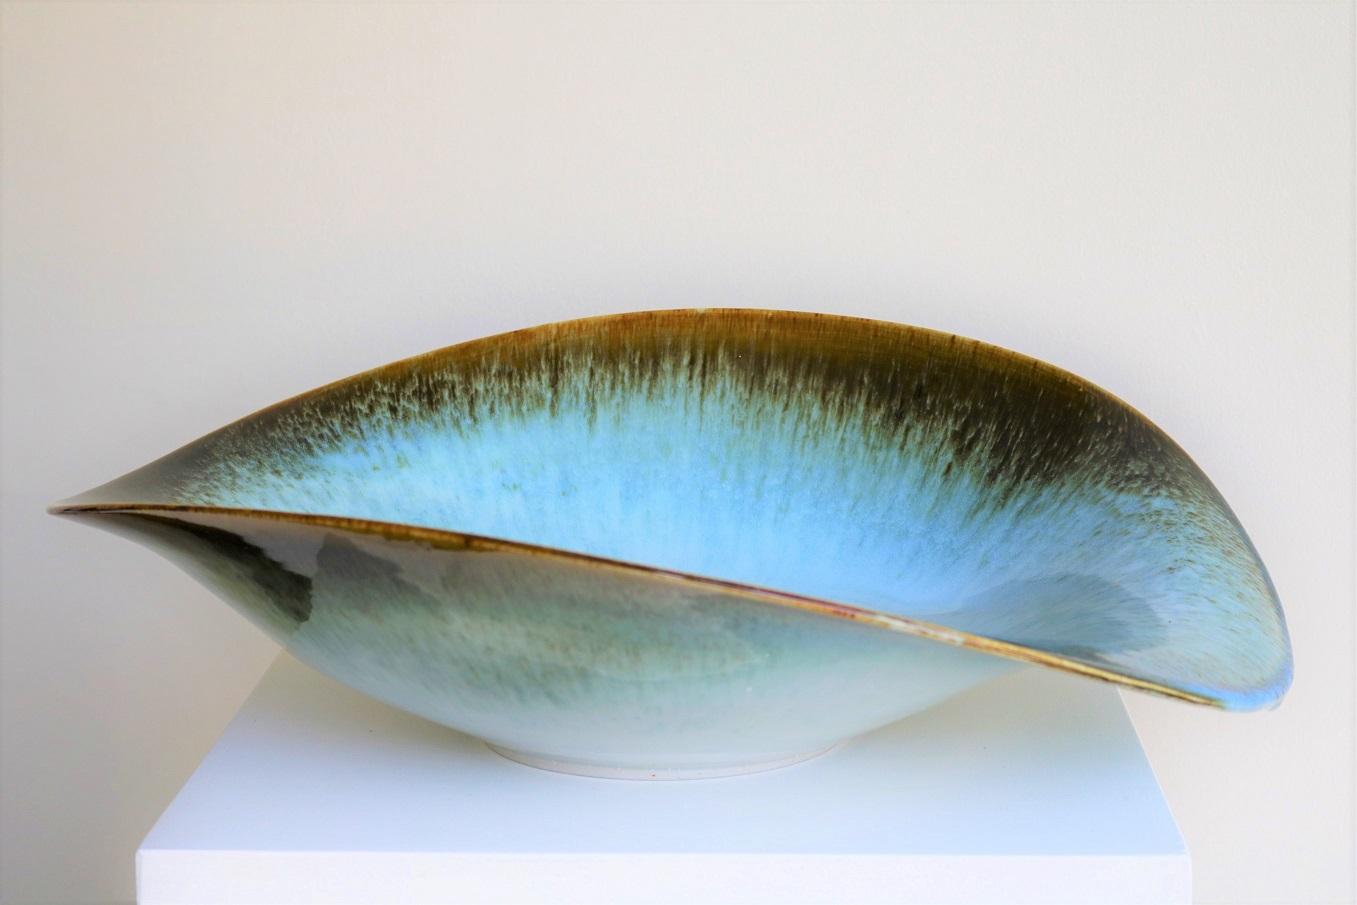 Brian Keyte,  Oceanic,  stoneware, temoku and salted chun glazes, H16 x W53.5 x D47cm, 2018 SOLD